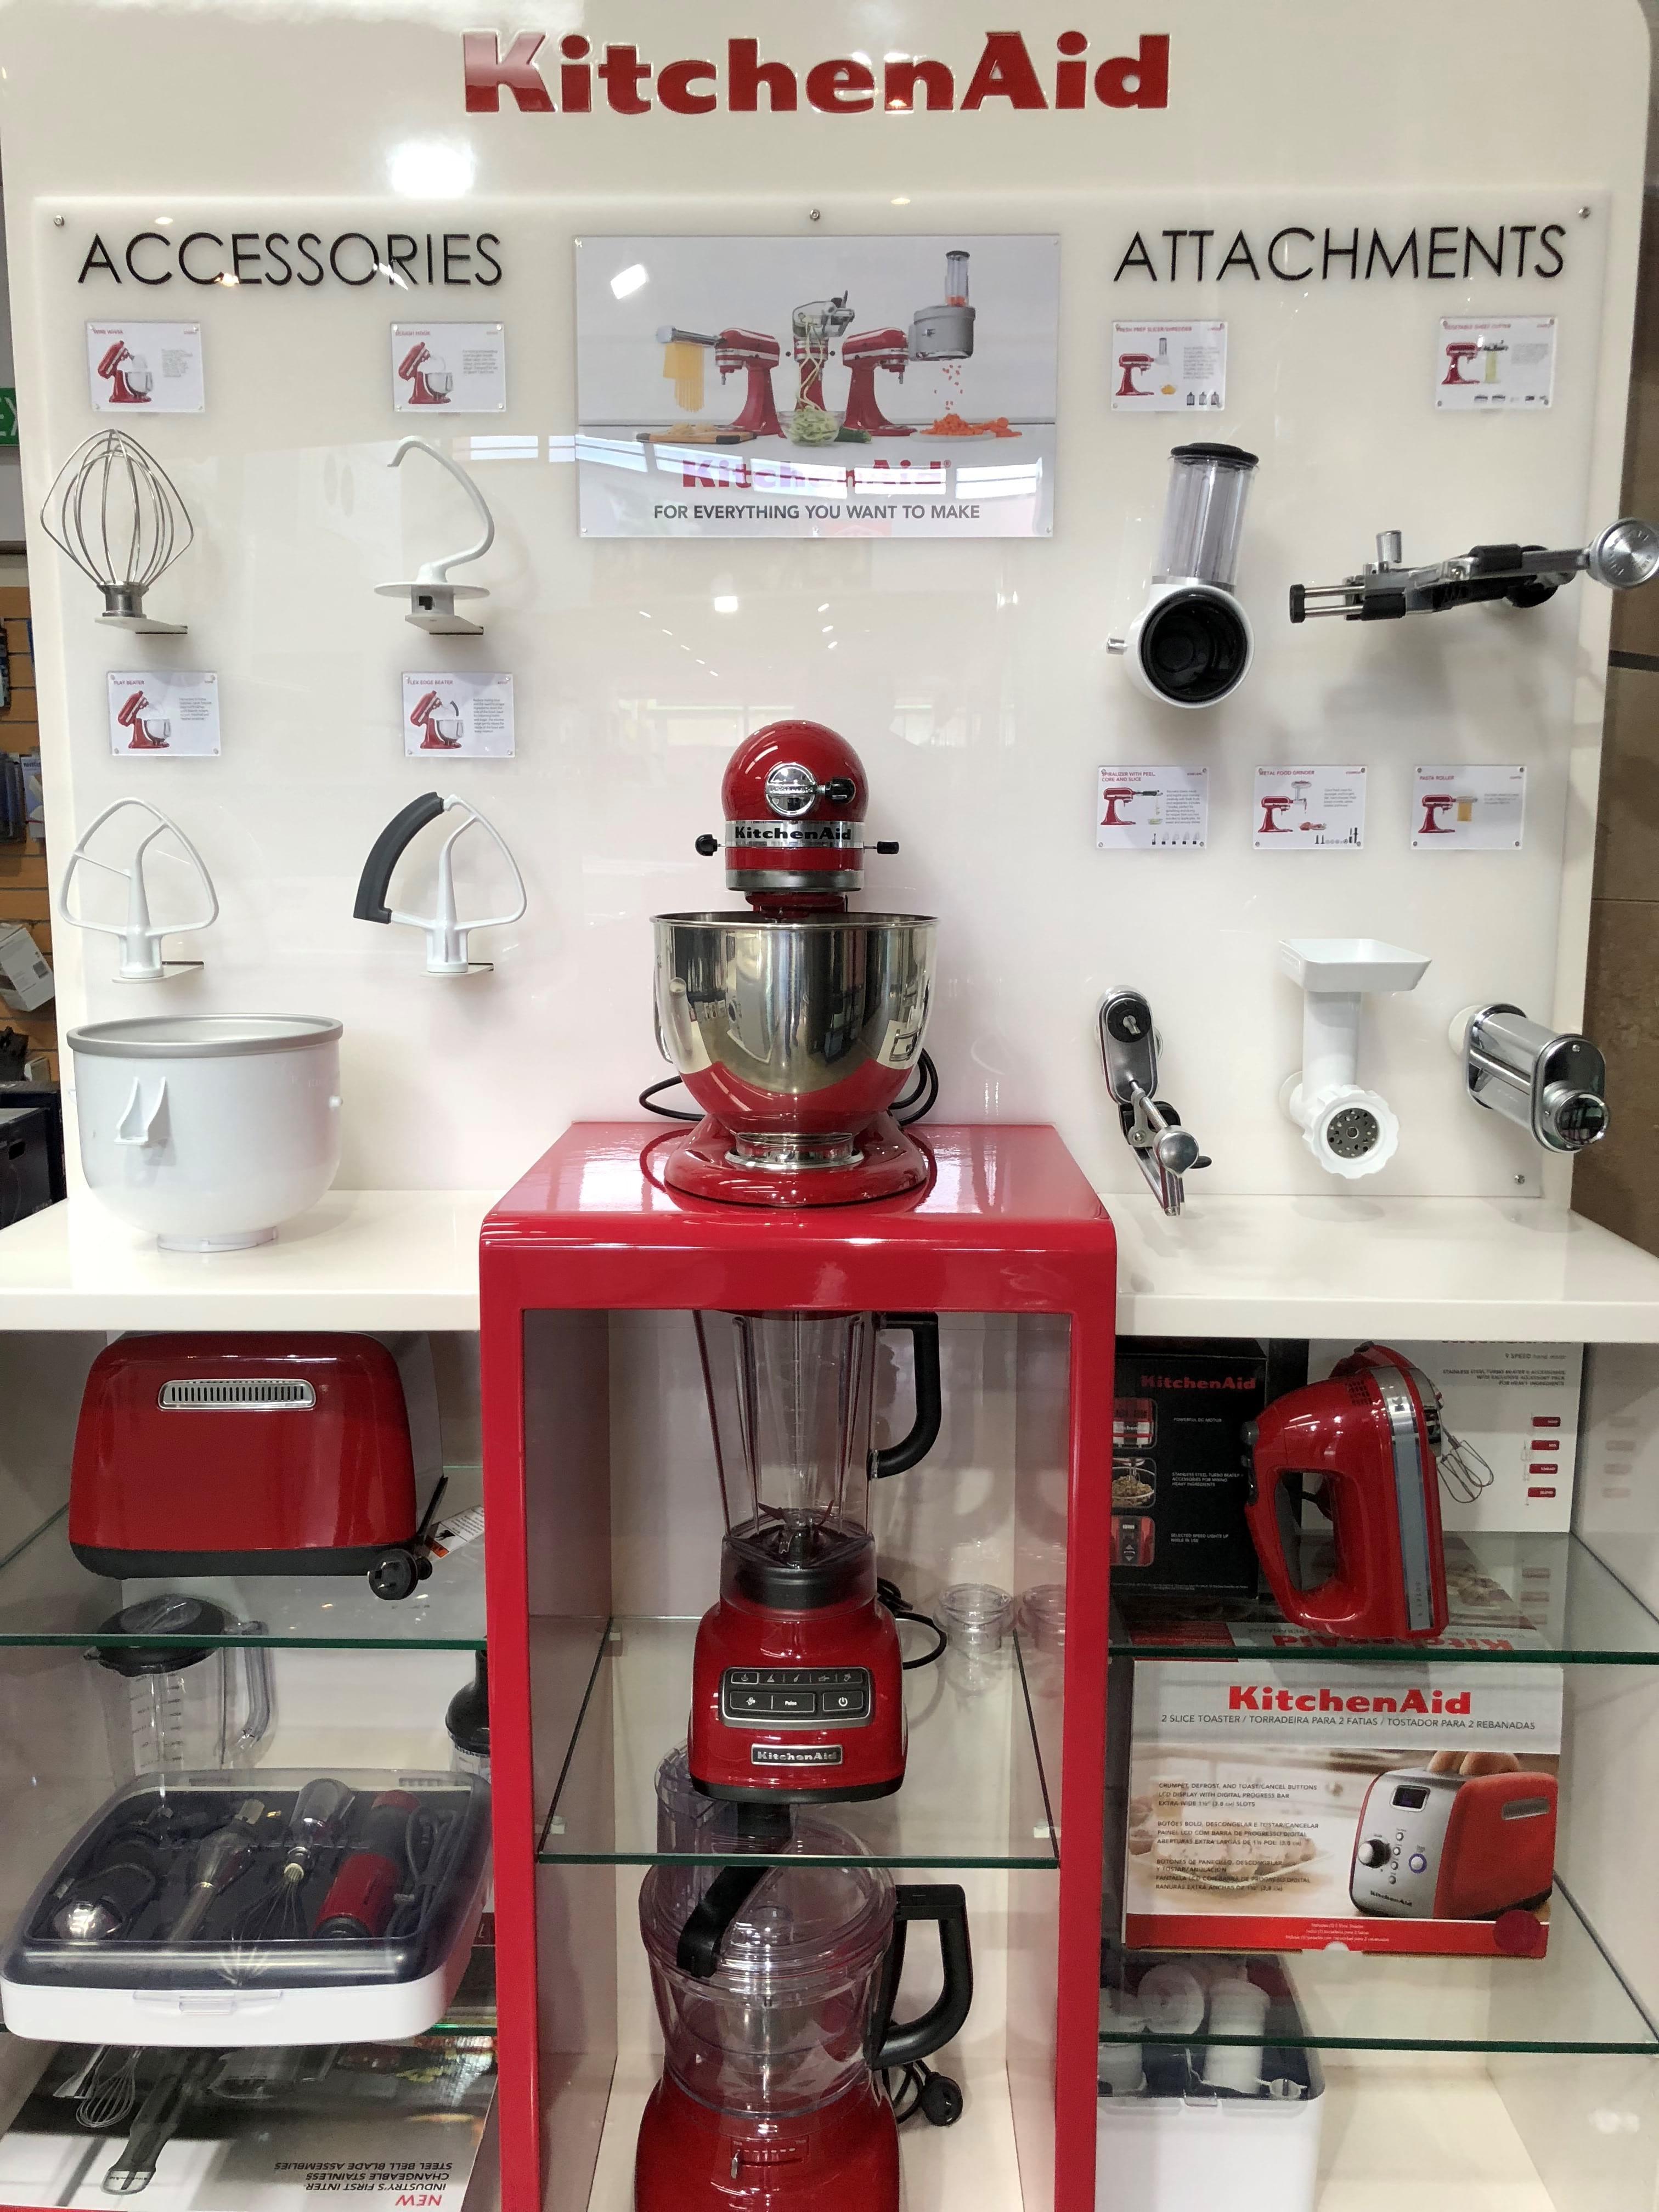 KitchenAid Experience Store - Small Appliances